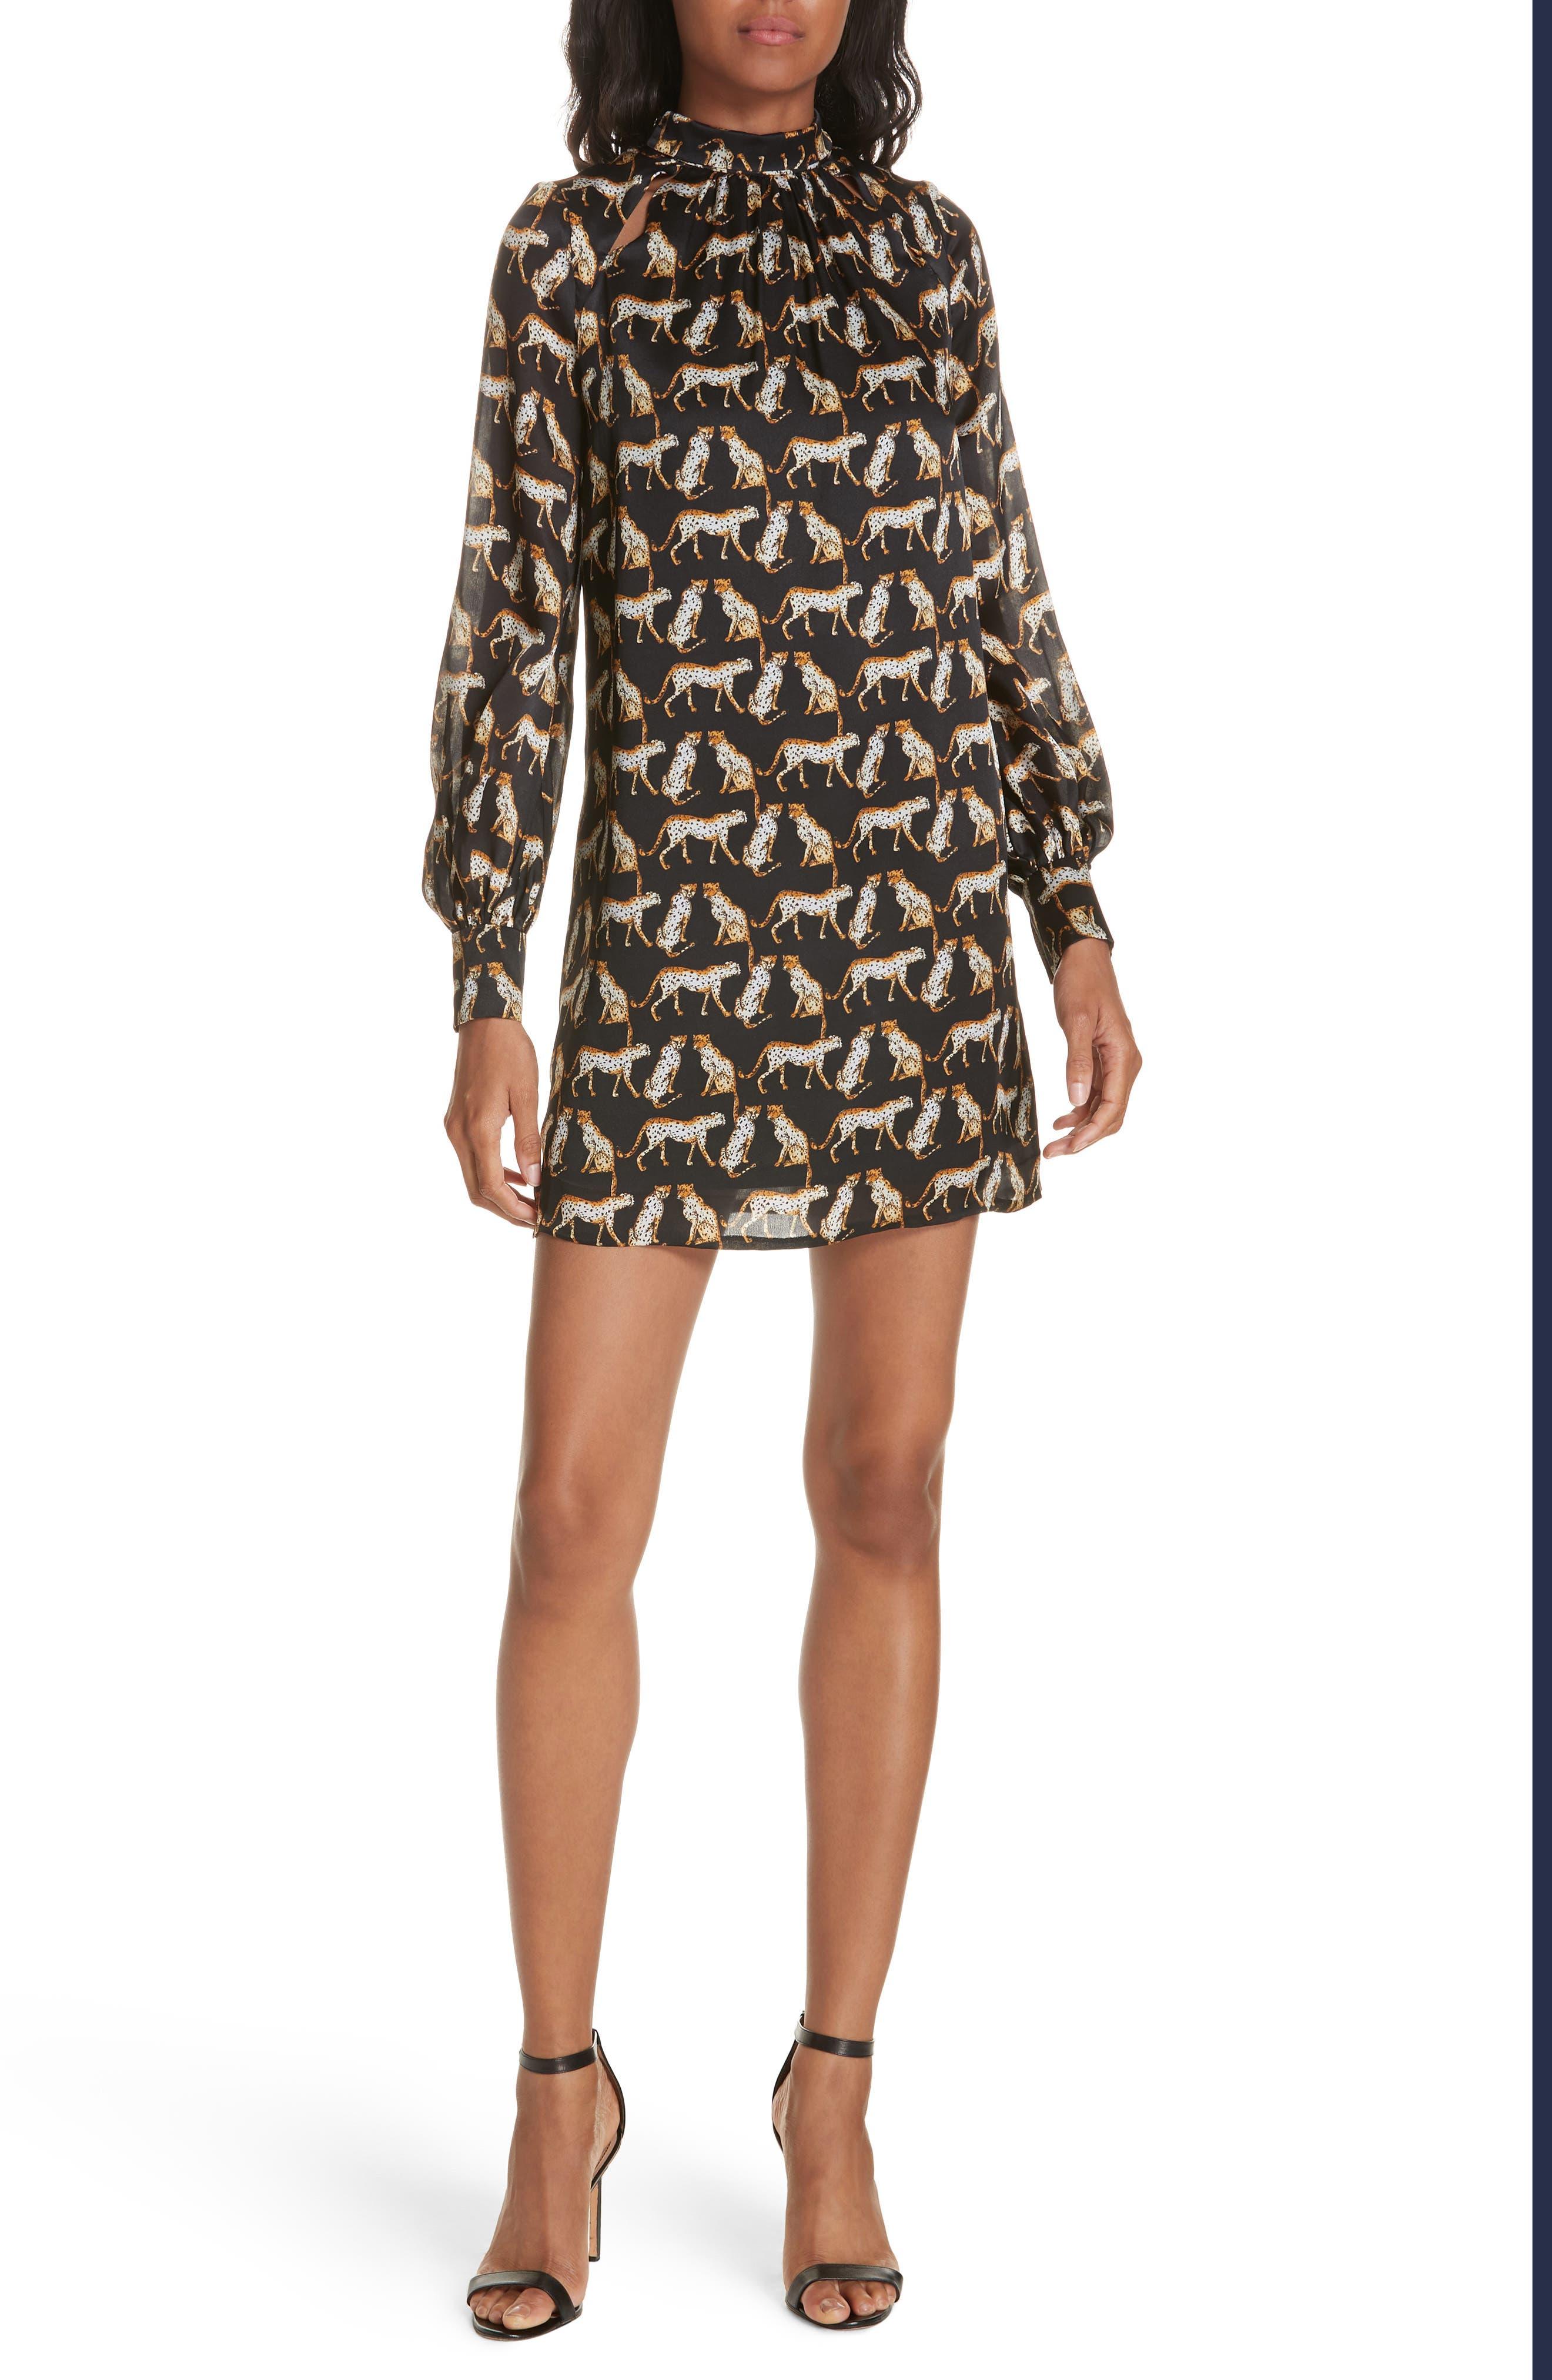 MILLY,                             Cheetah Print High Neck Silk Dress,                             Alternate thumbnail 5, color,                             001